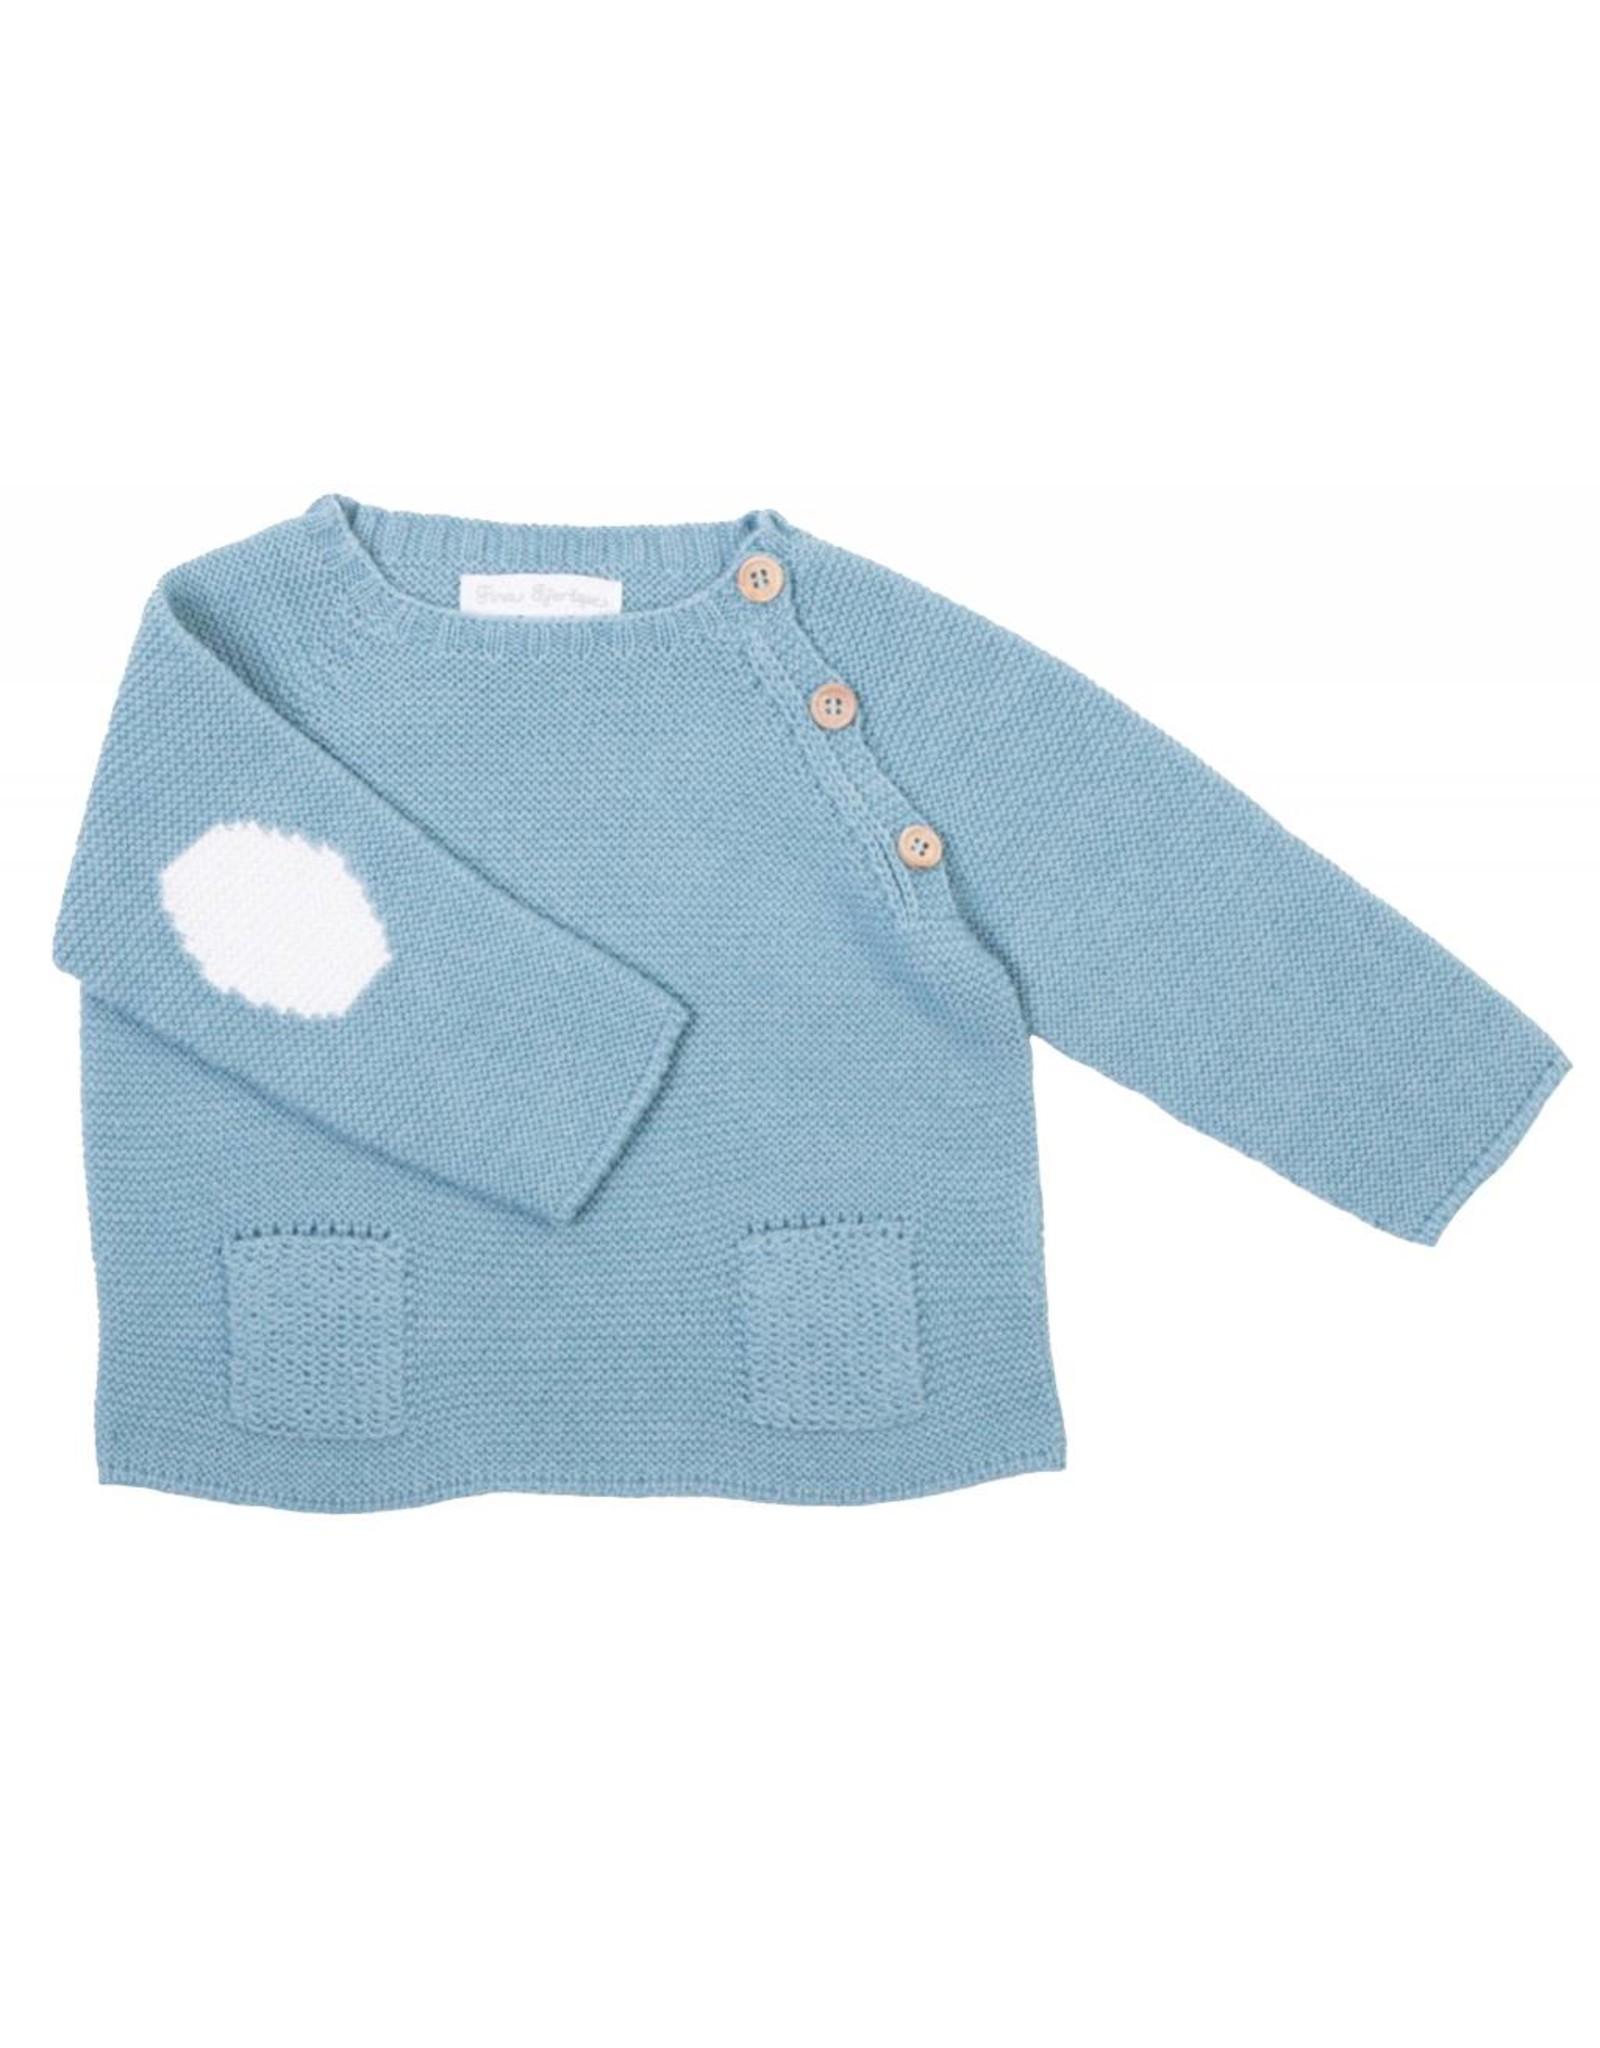 FINA EJERIQUE Teal Sweater